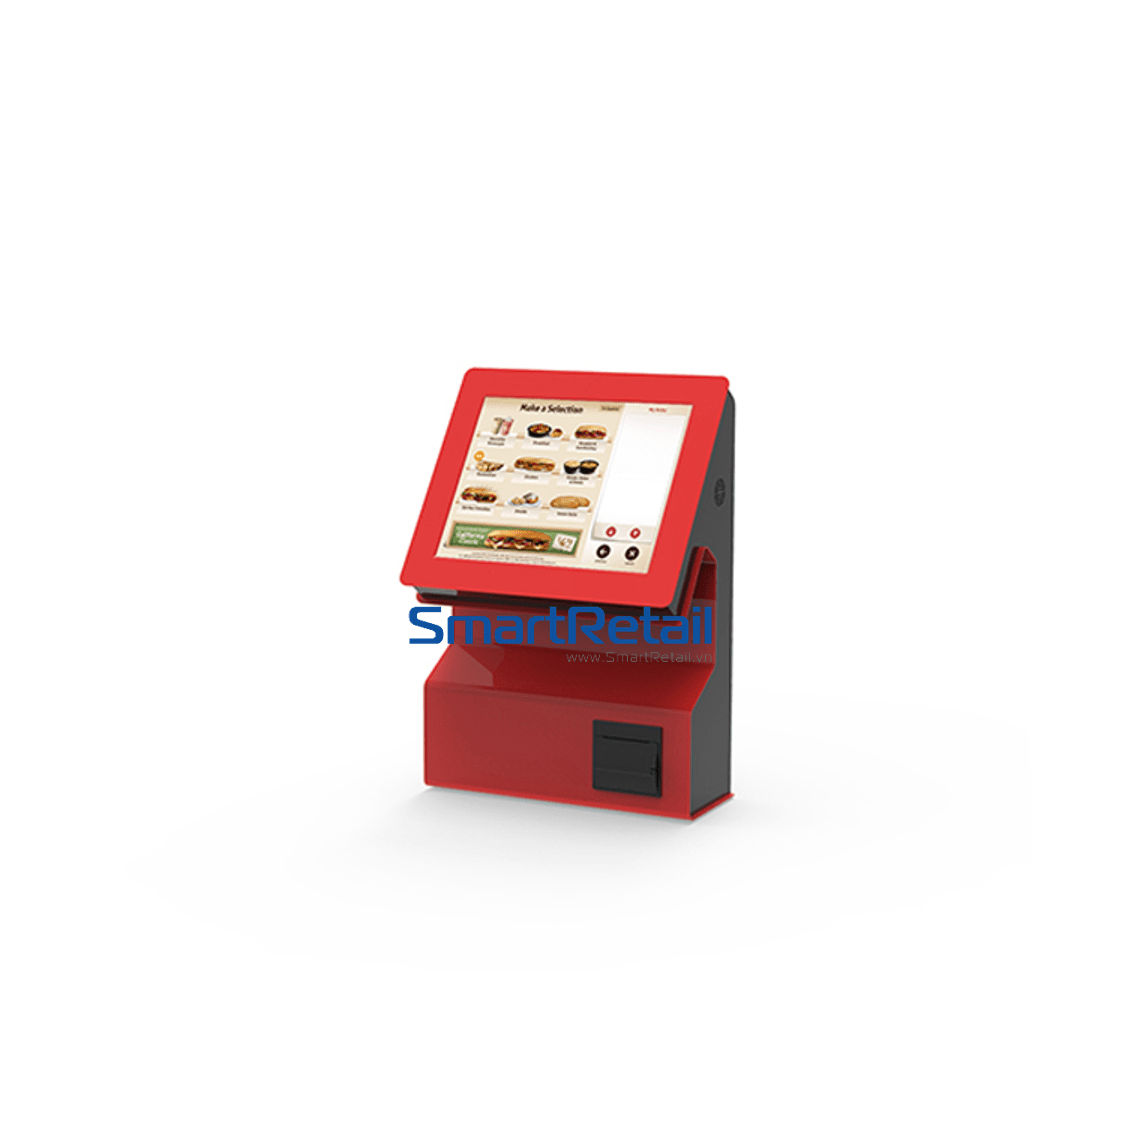 SmartRetail Kiosk Order KSF A119 S4 5